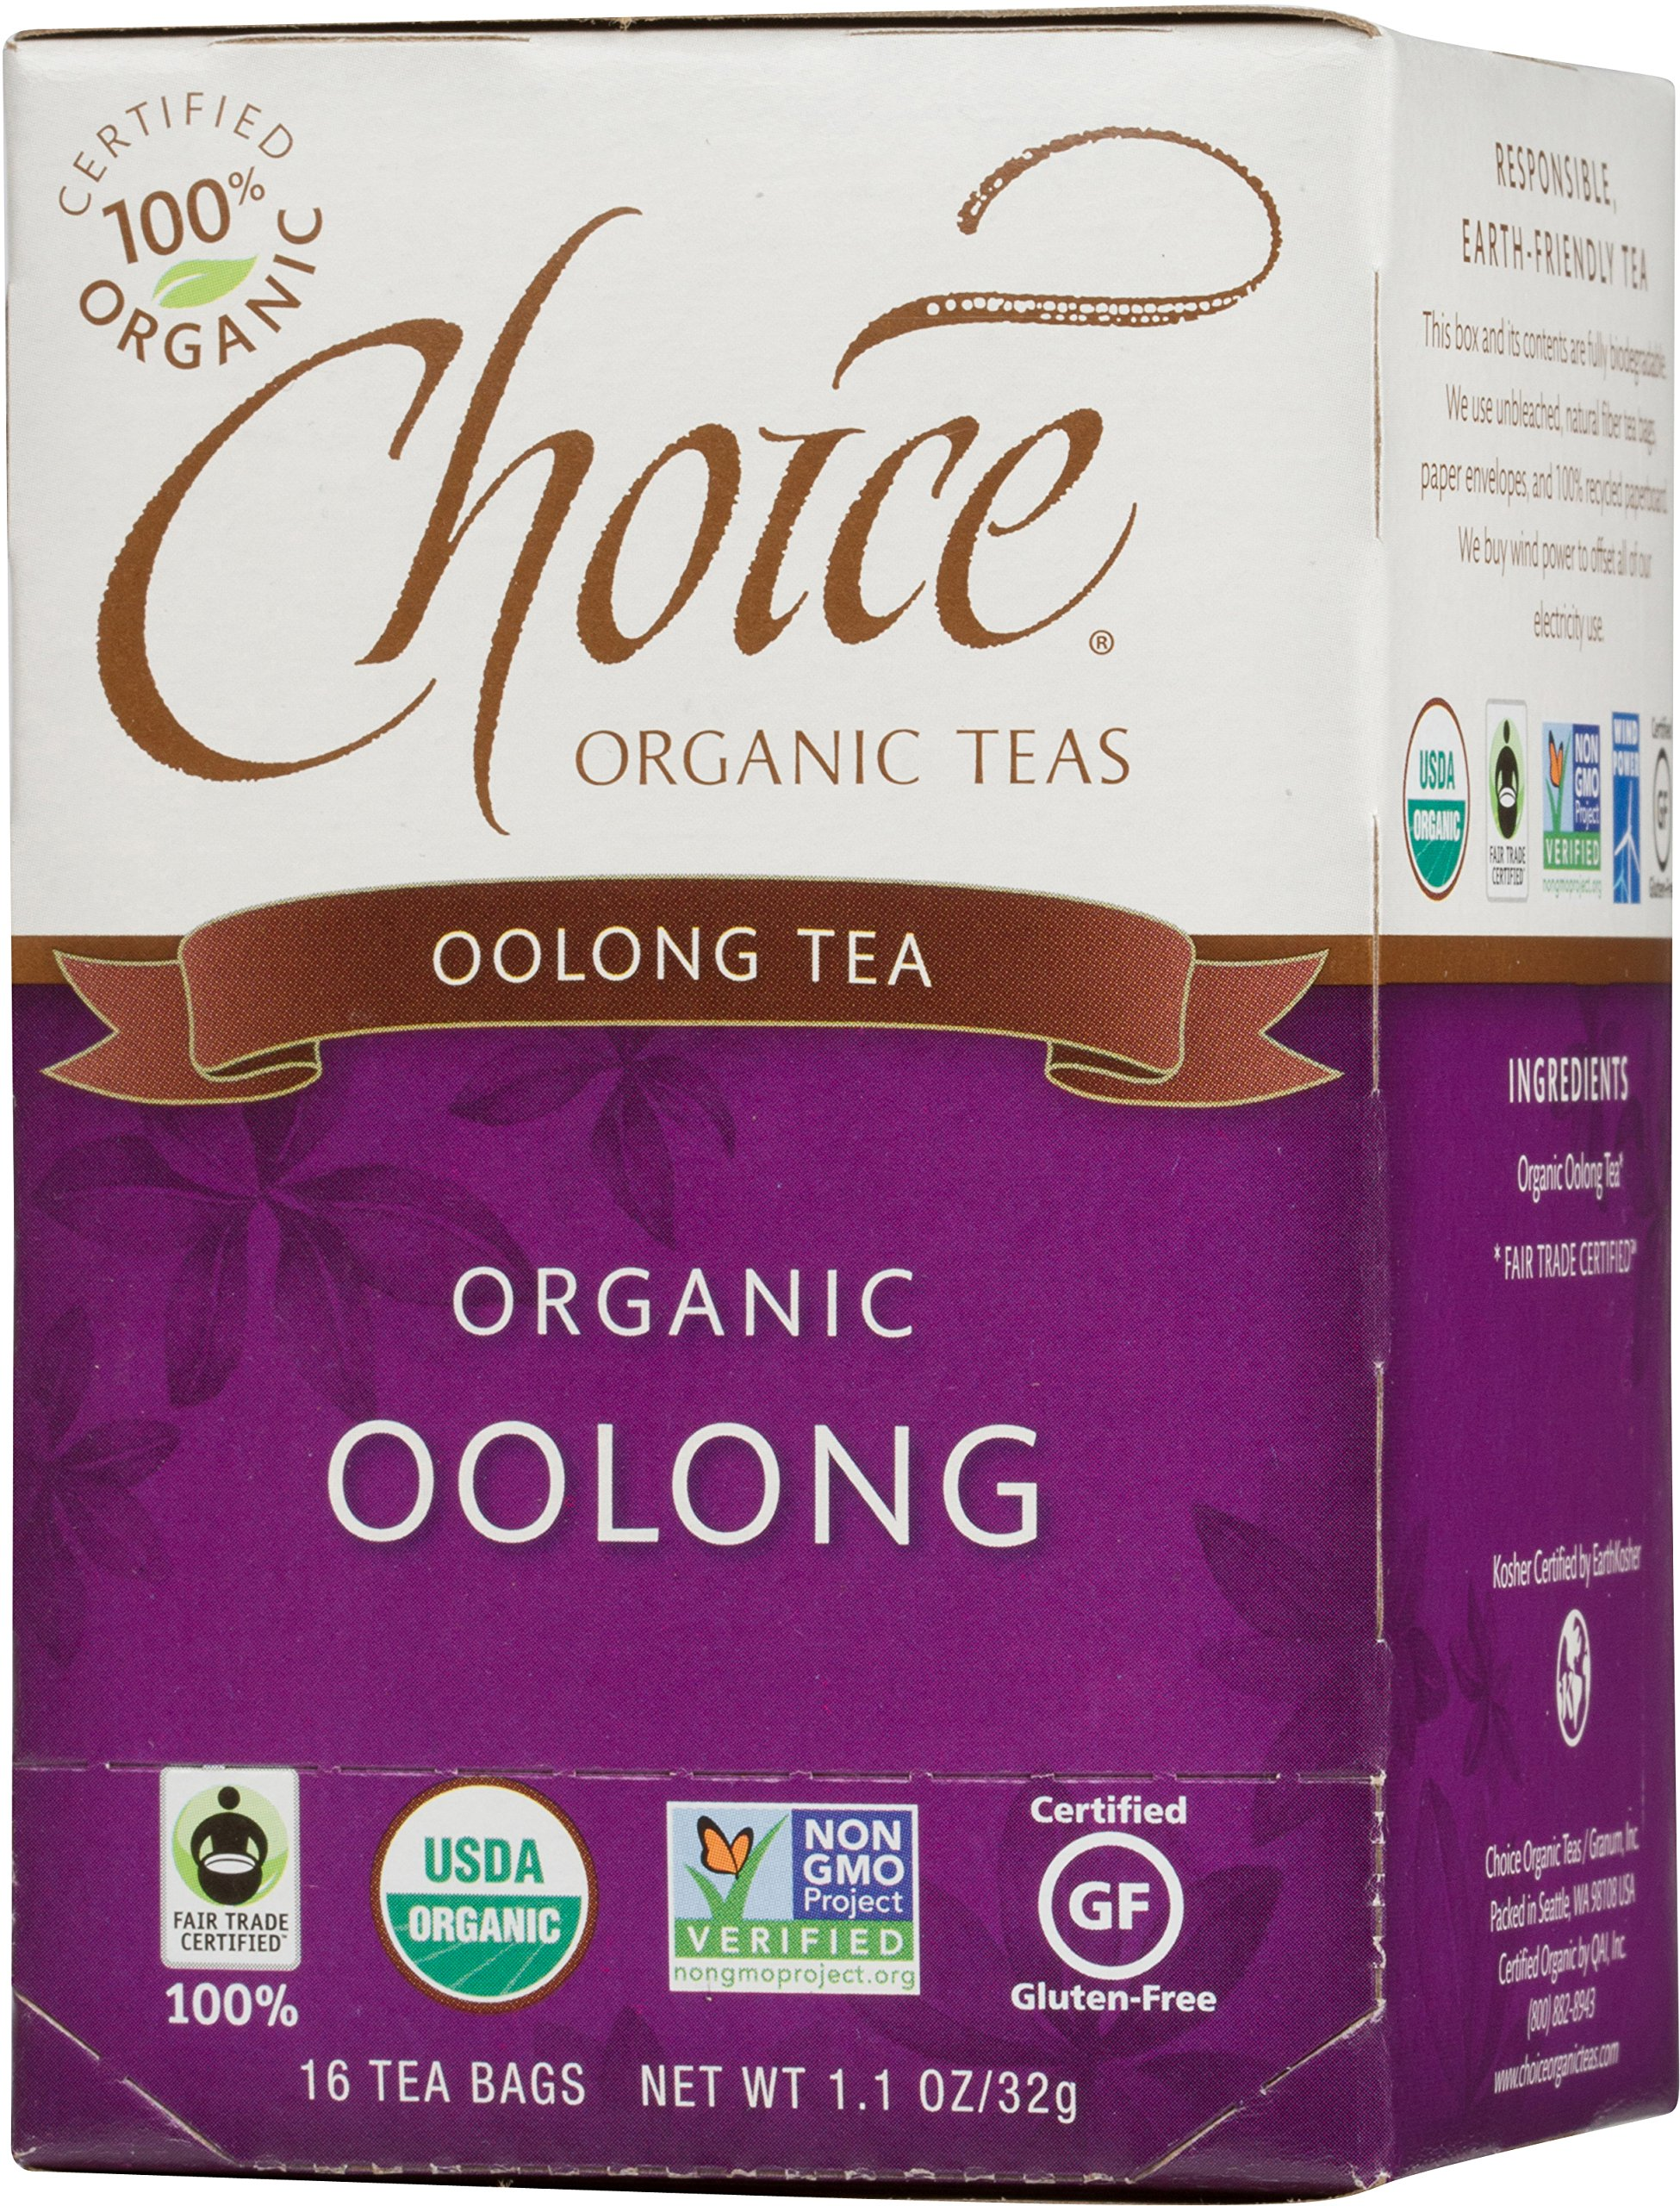 Choice Organic Teas Oolong Tea, 16 Count, Pack of 6